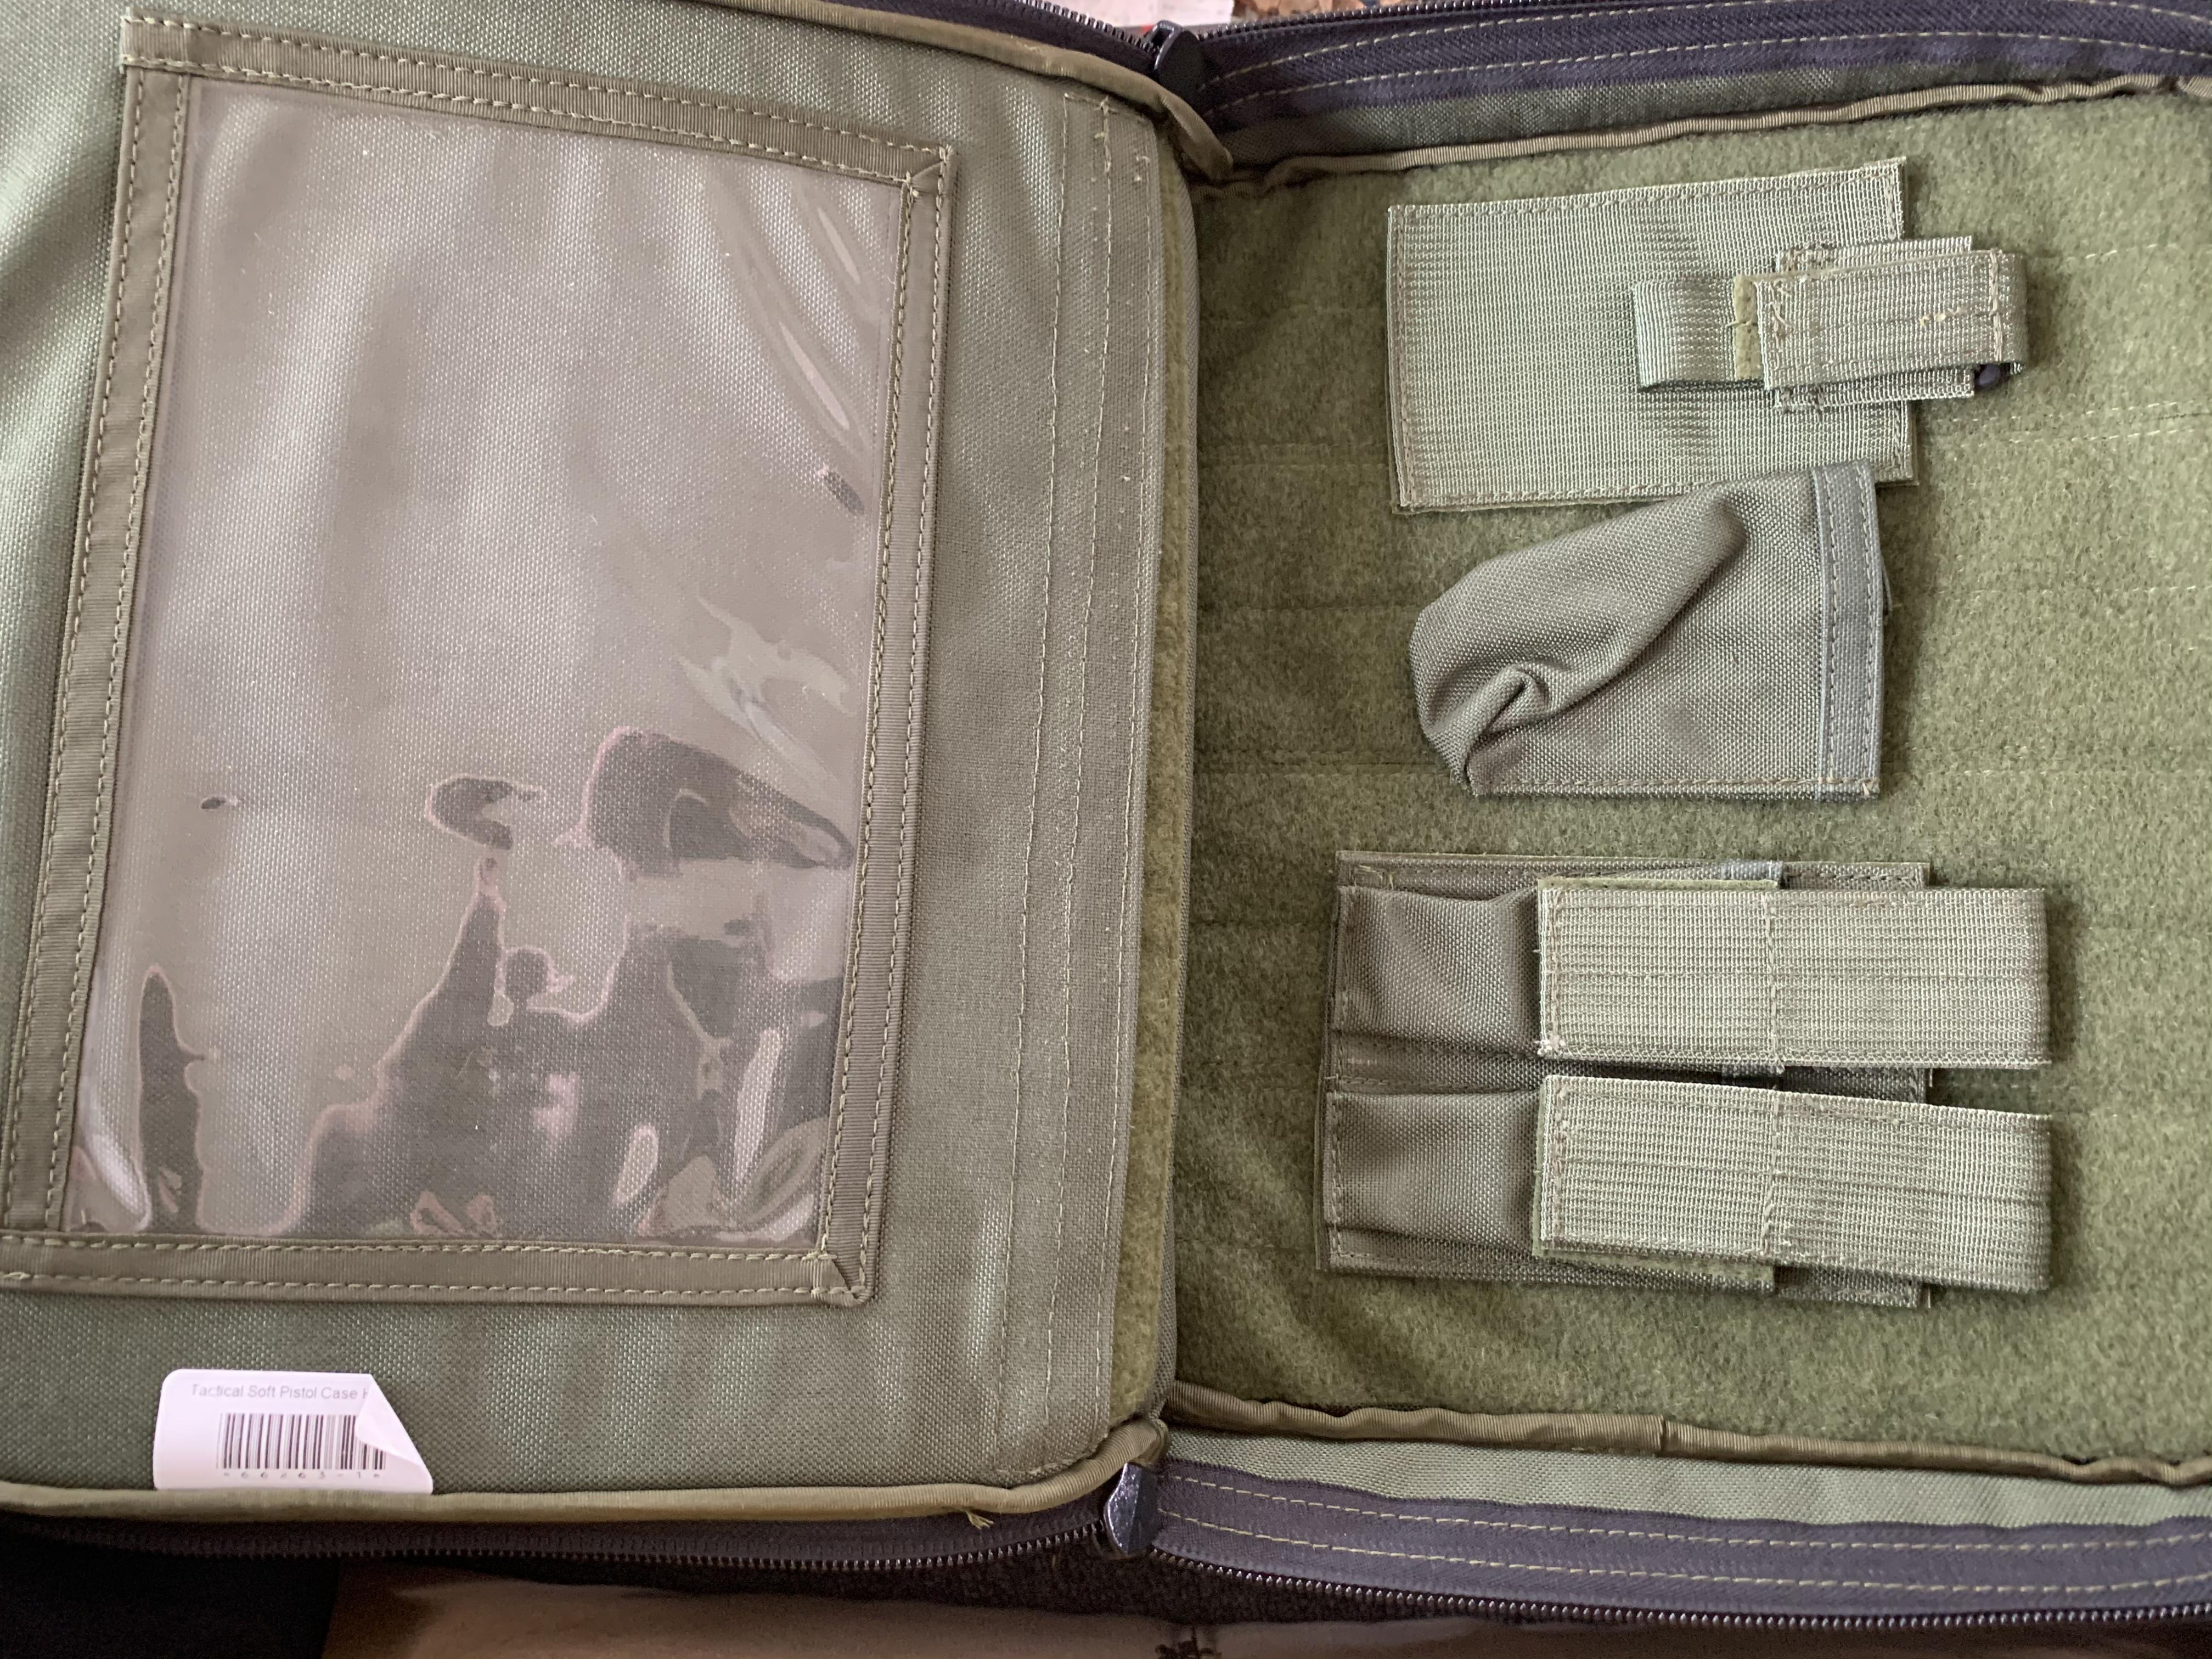 WTS: HK TACTICAL PISTOL BAG OD Green $old shipped-image0-5.jpg